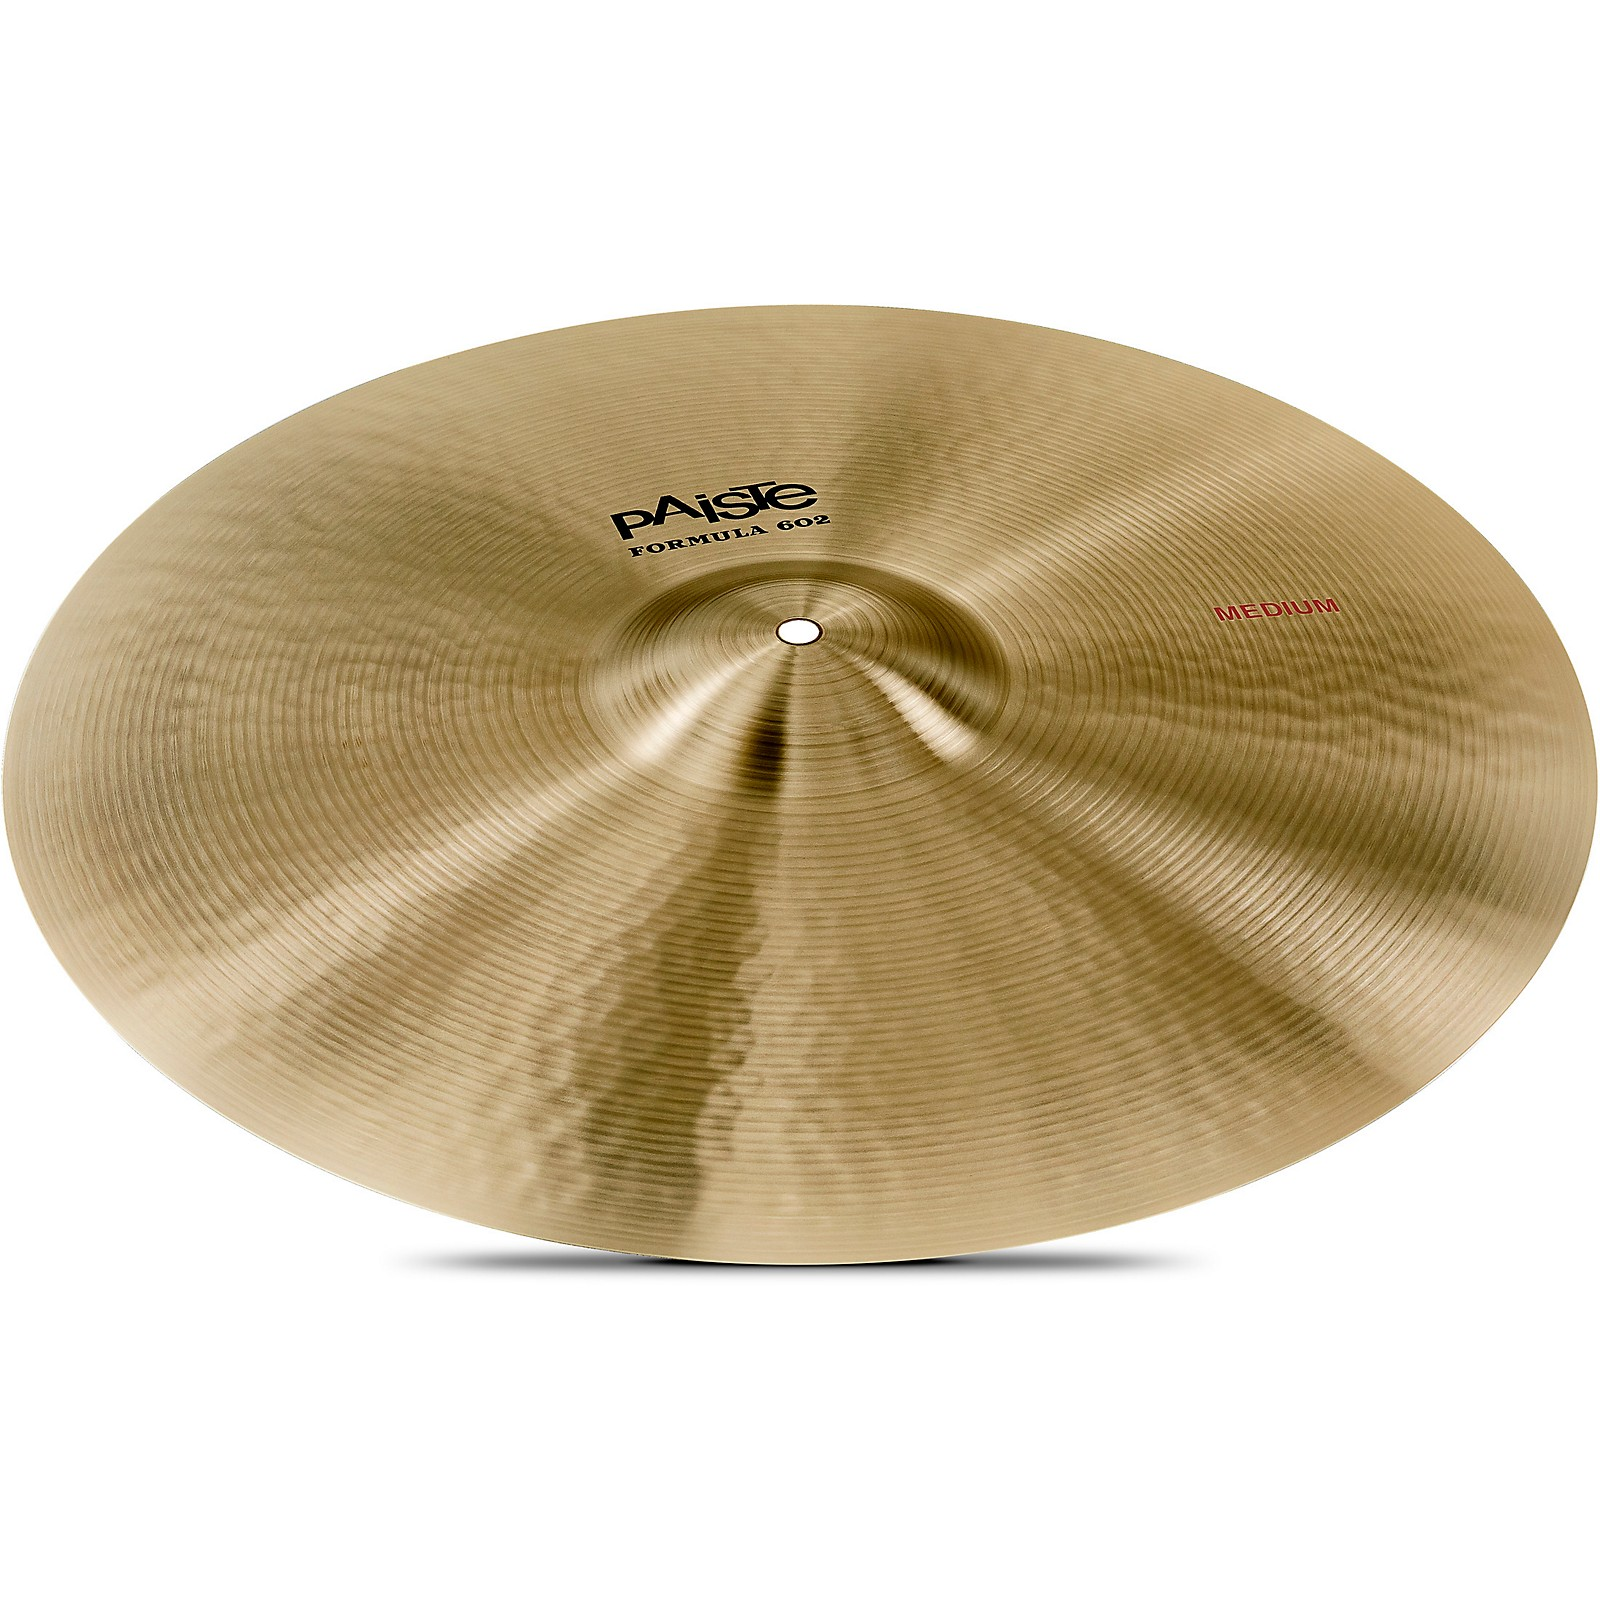 Paiste Formula 602 Medium Crash Cymbal